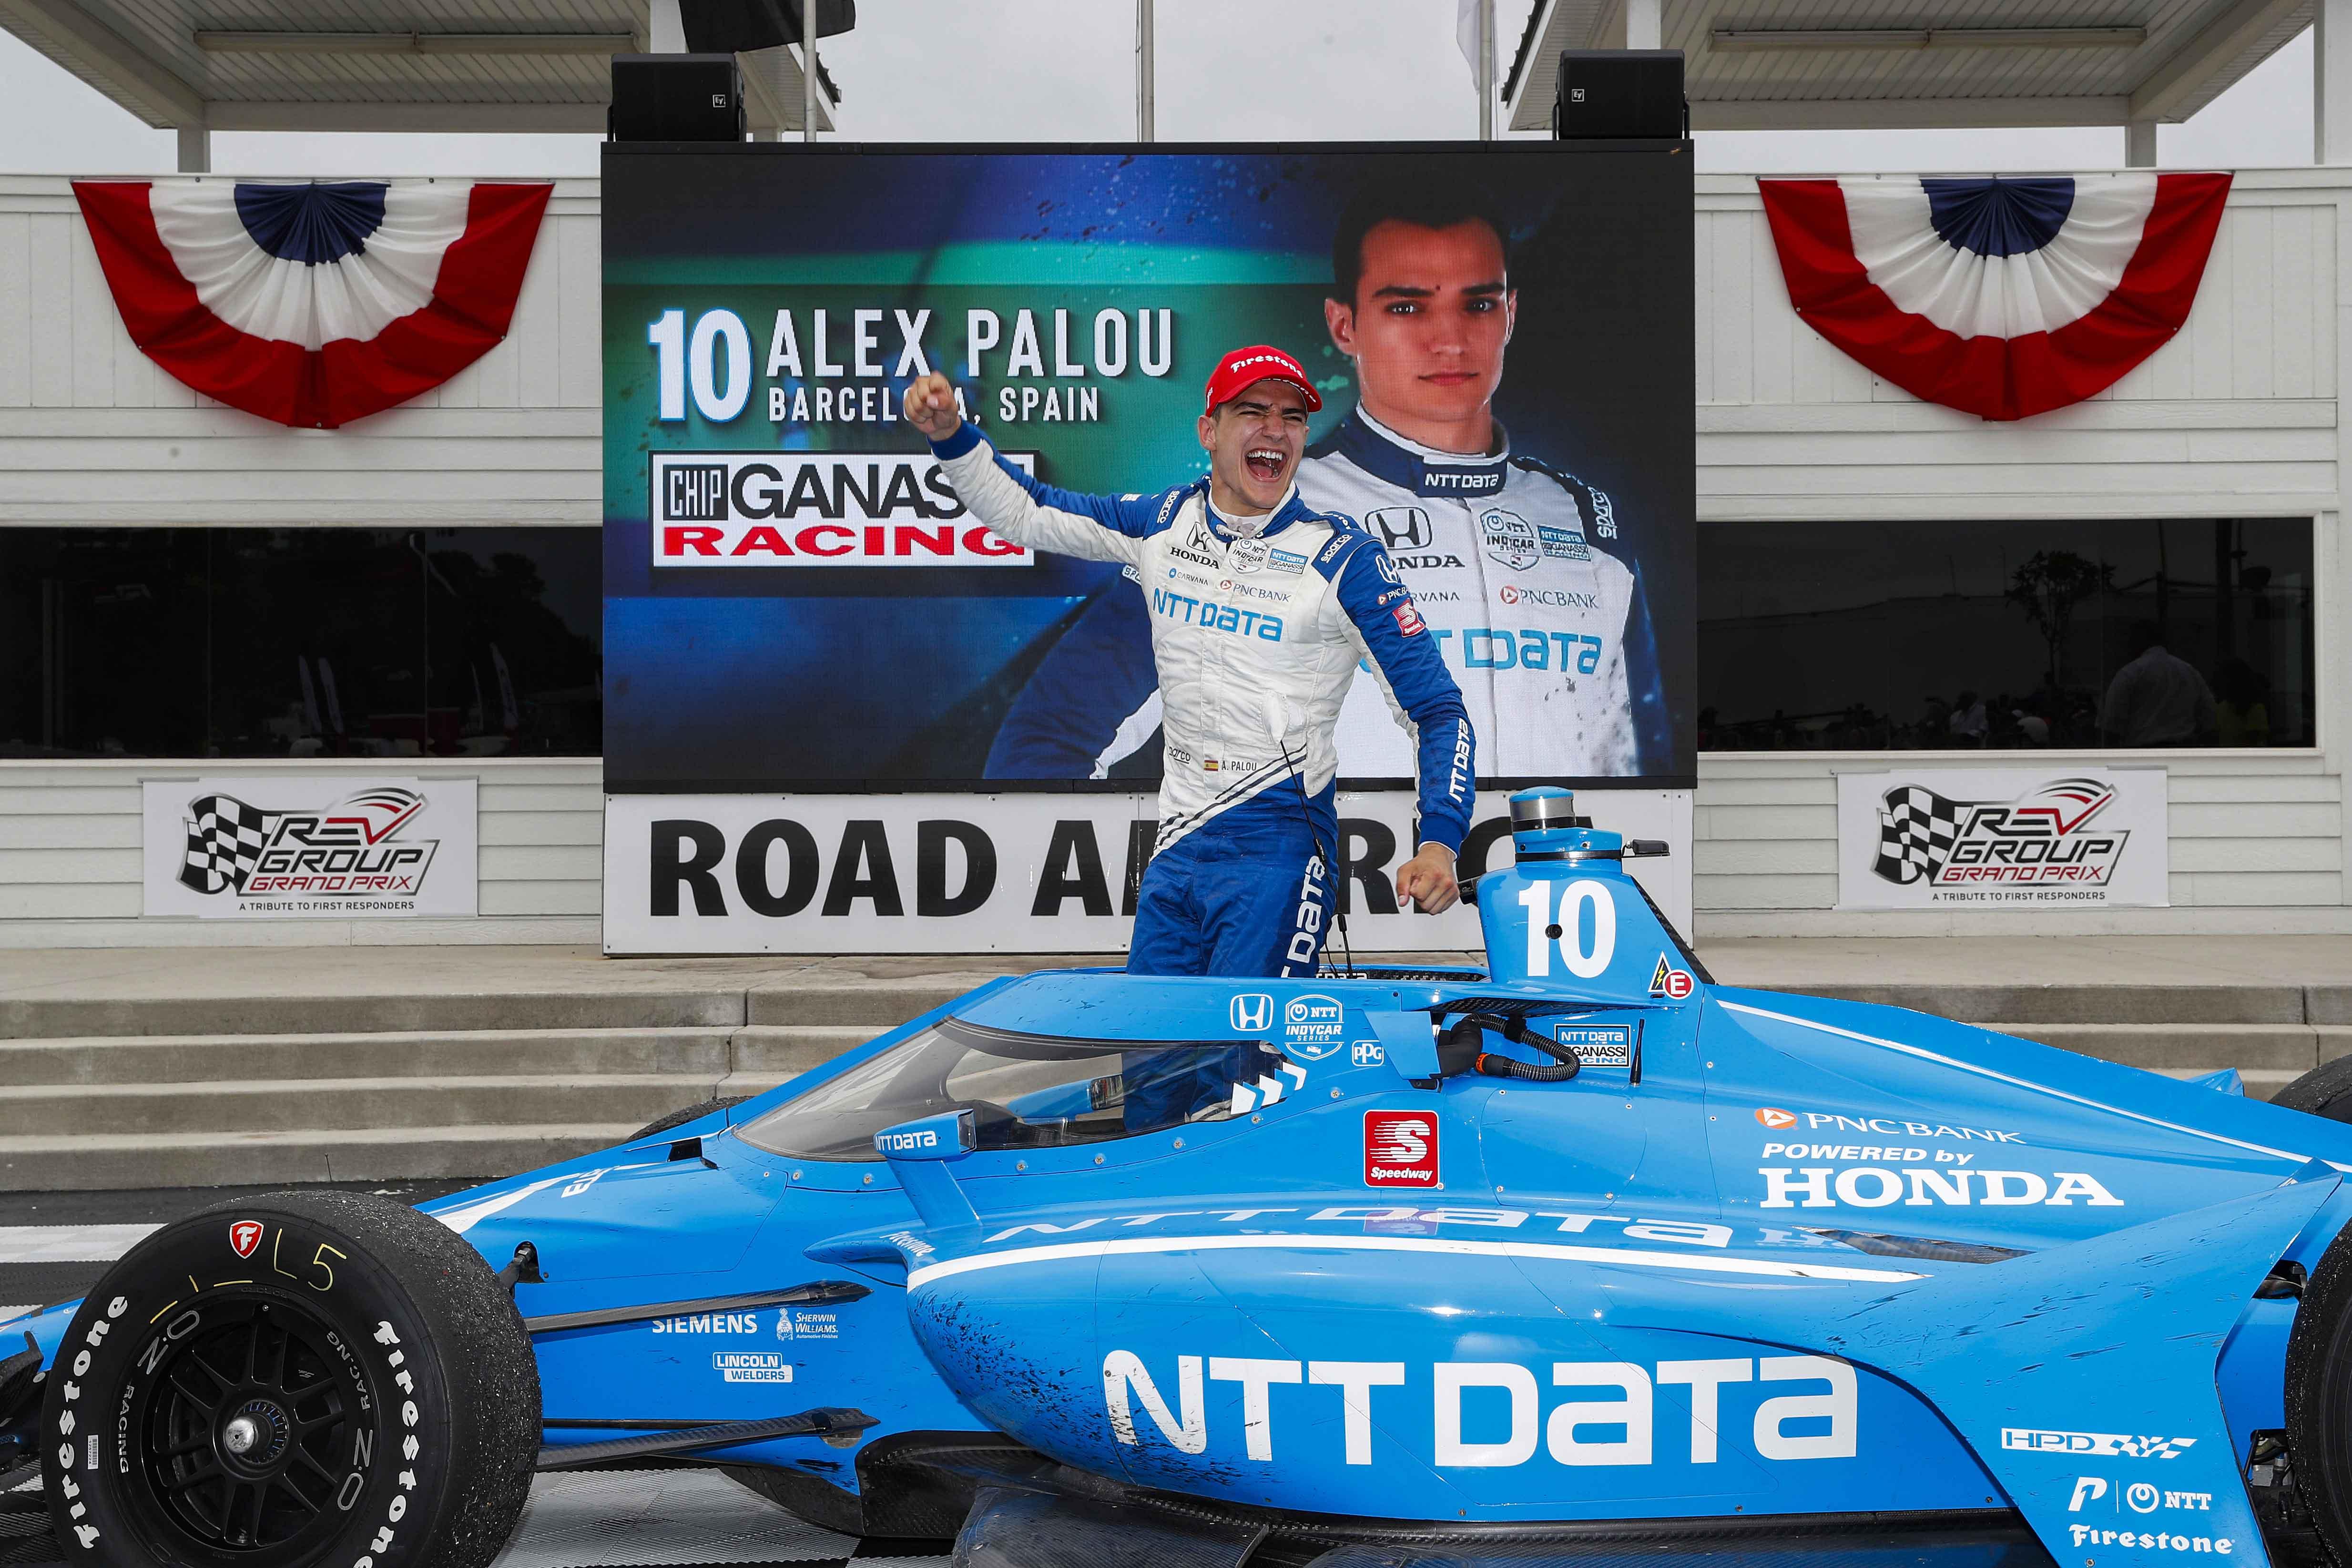 Palou Leads Honda 1-2 at Road America